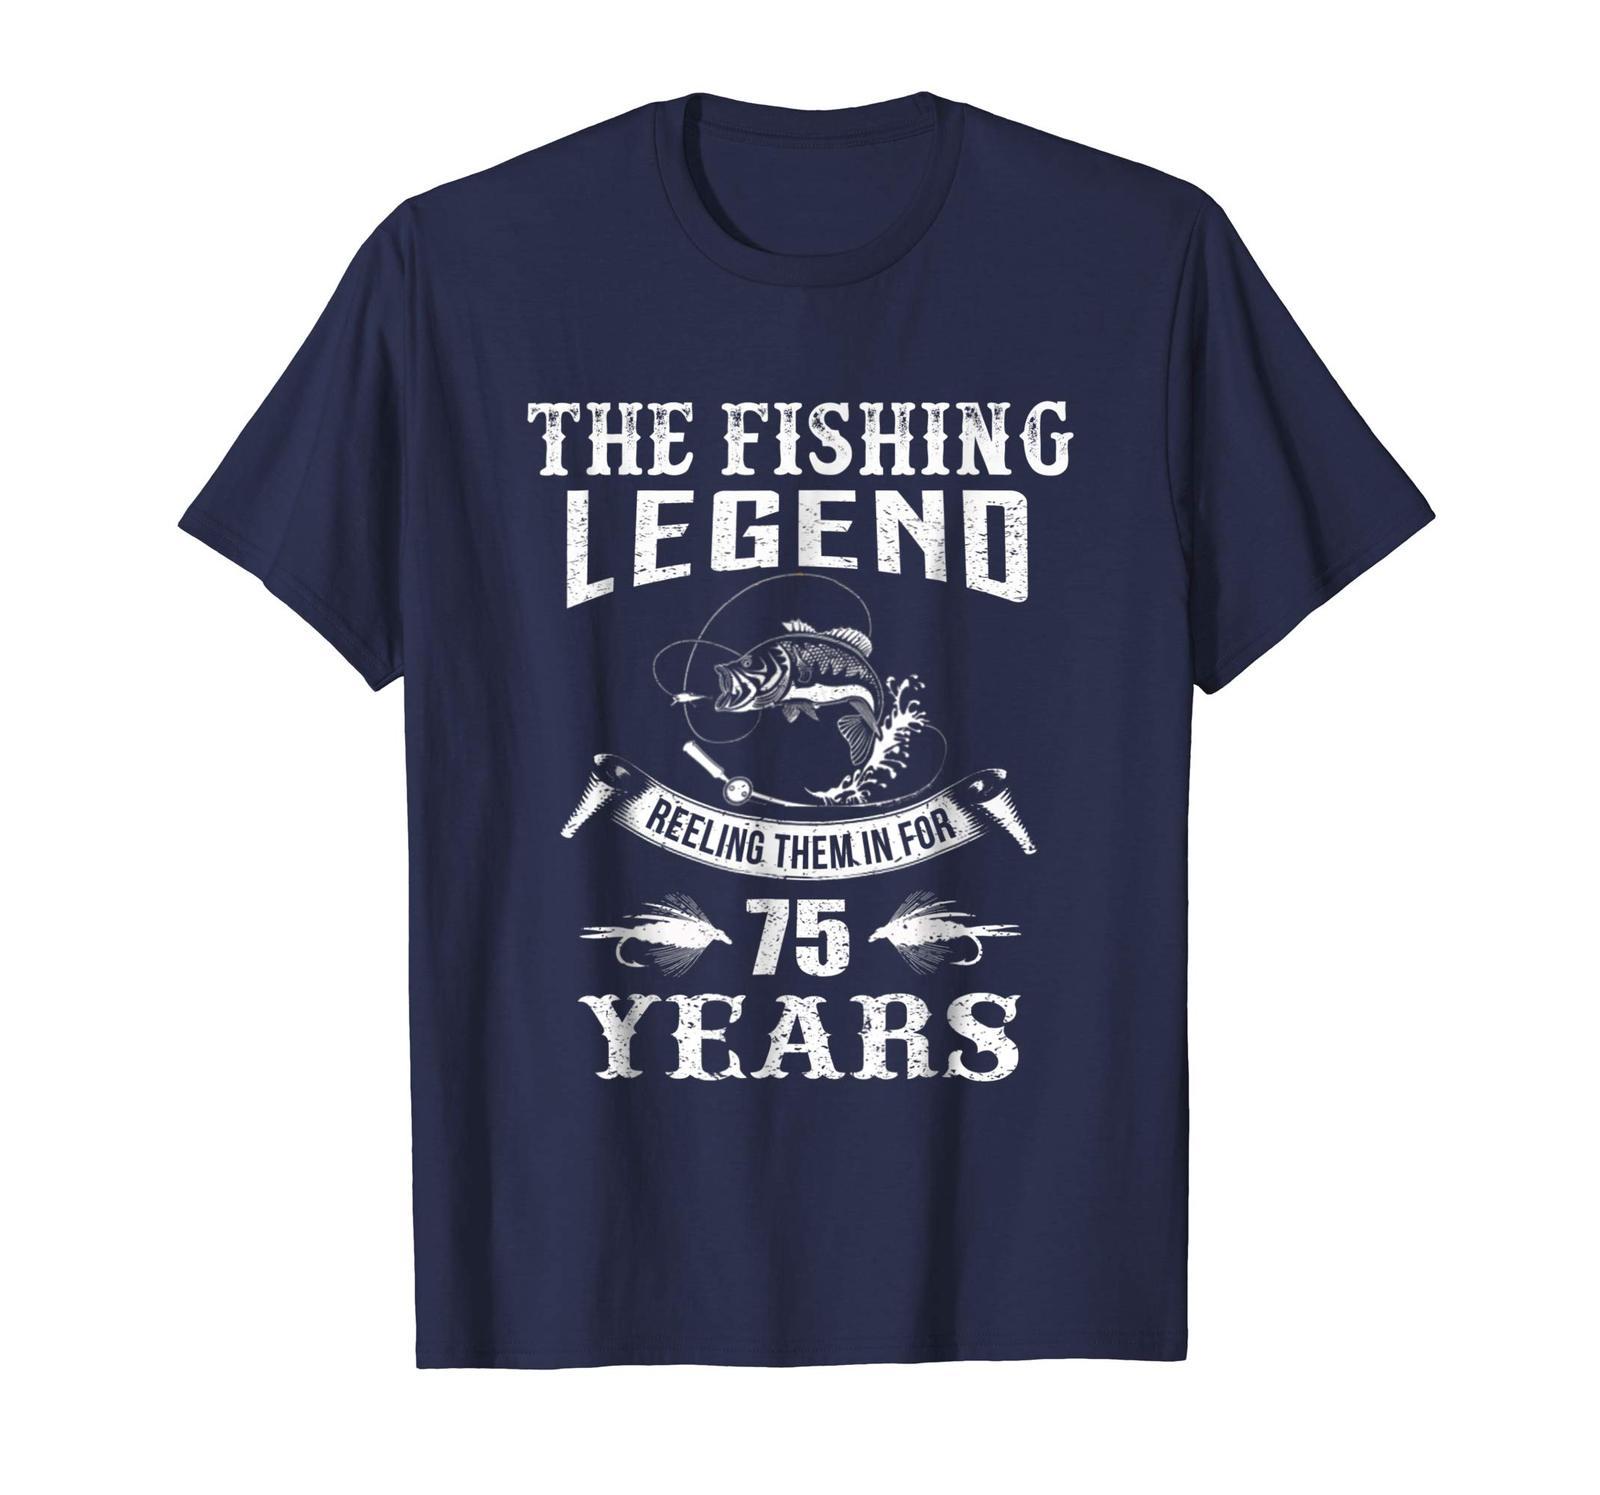 New Shirt -  Fishing Legend 75th Birthday Gifts Shirt for Fisherman Men